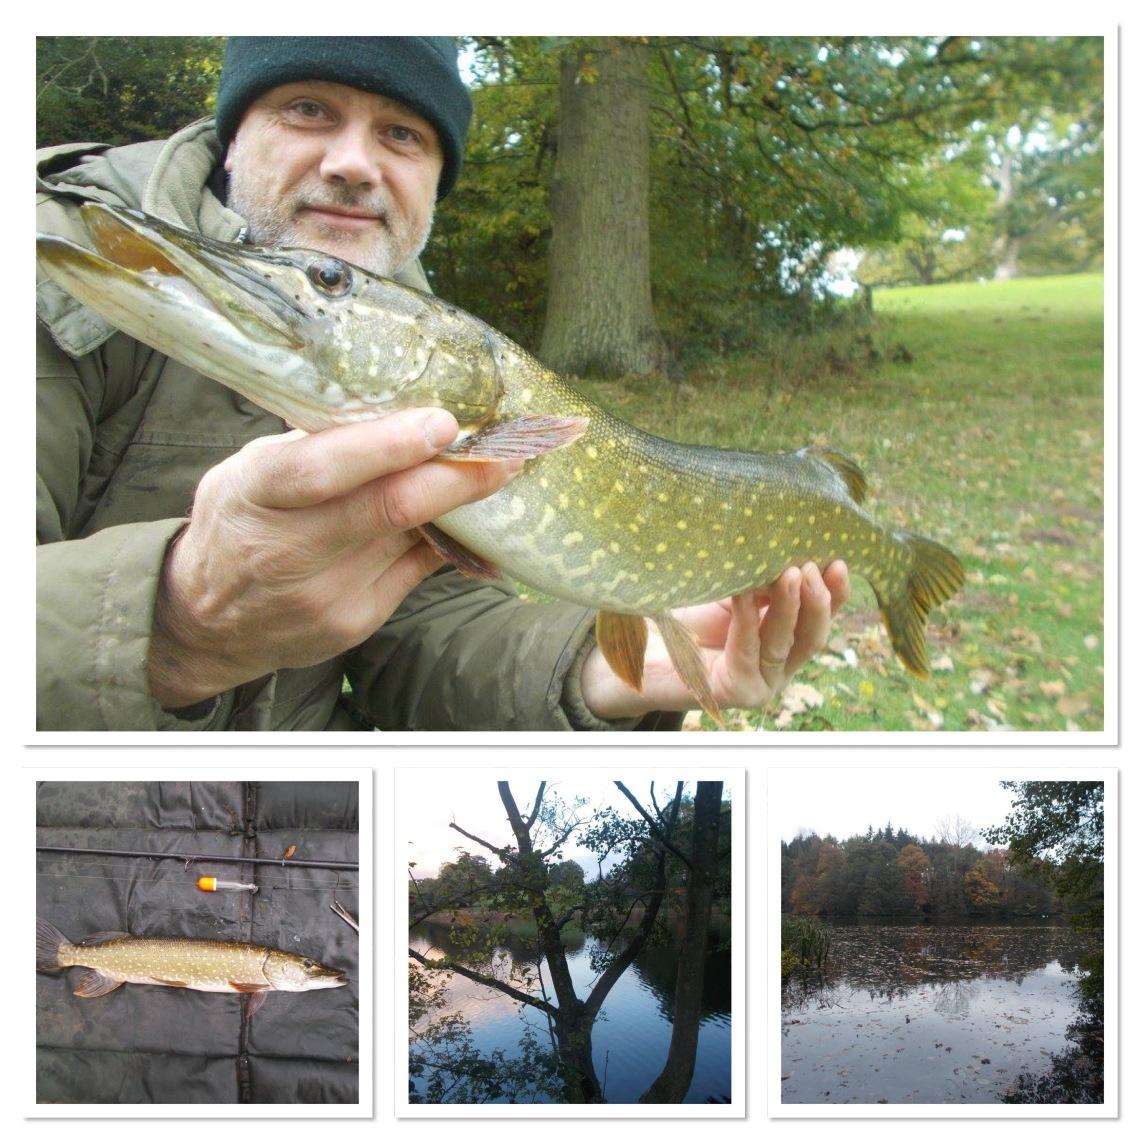 Pike fishing in Shropshire